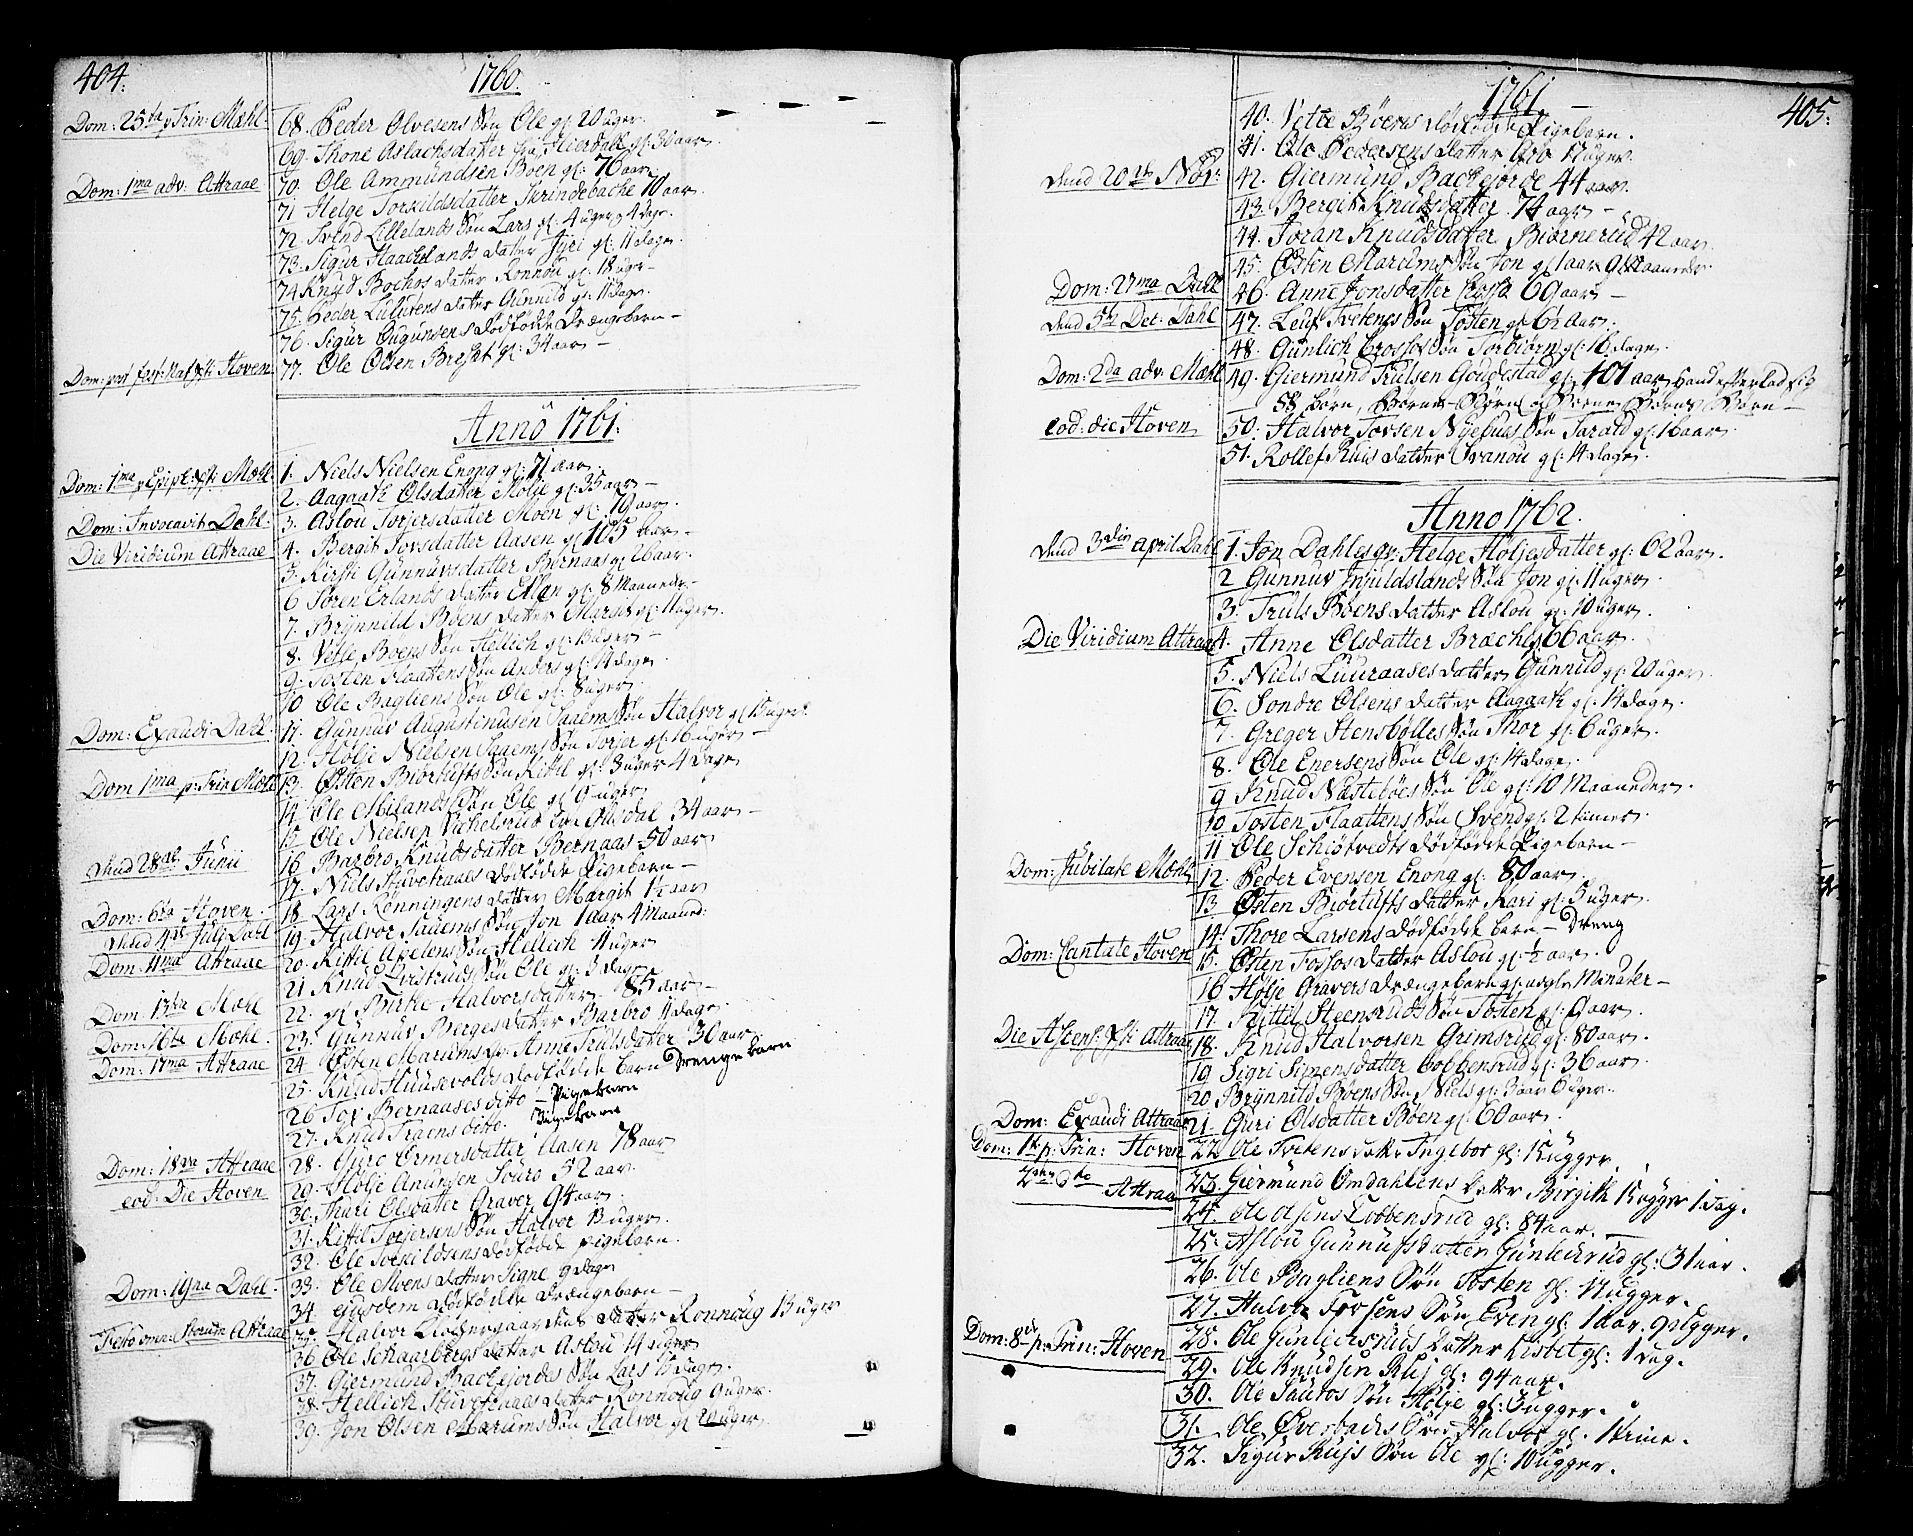 SAKO, Tinn kirkebøker, F/Fa/L0002: Ministerialbok nr. I 2, 1757-1810, s. 404-405